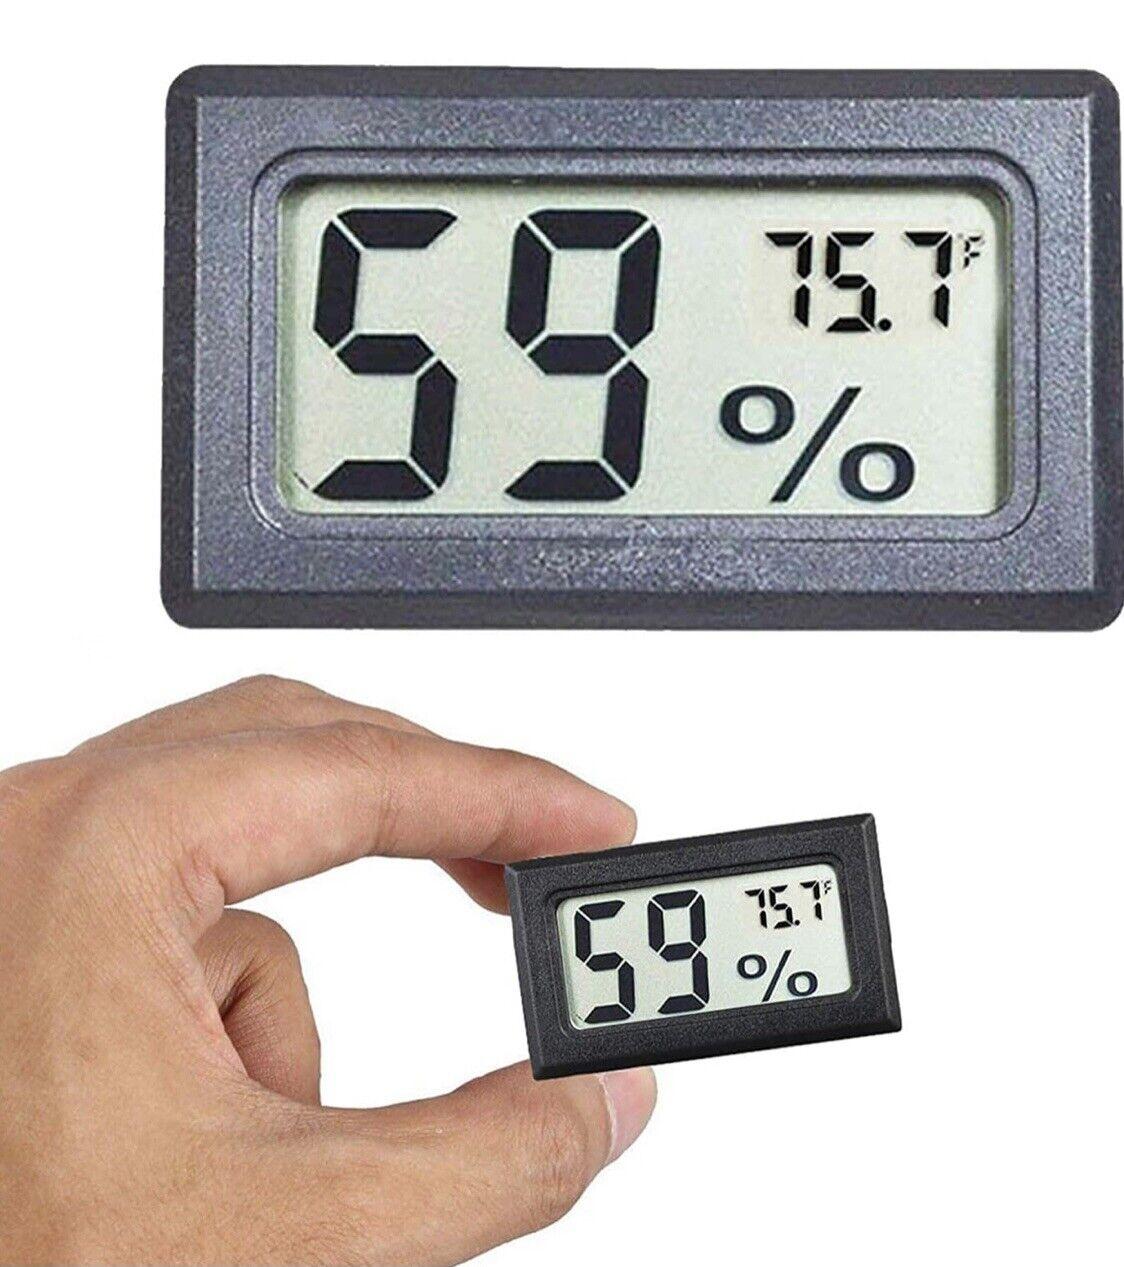 Mini Hygrometer, Thermometer: Lot Of 4! Measures Humidity & Temperature, Black